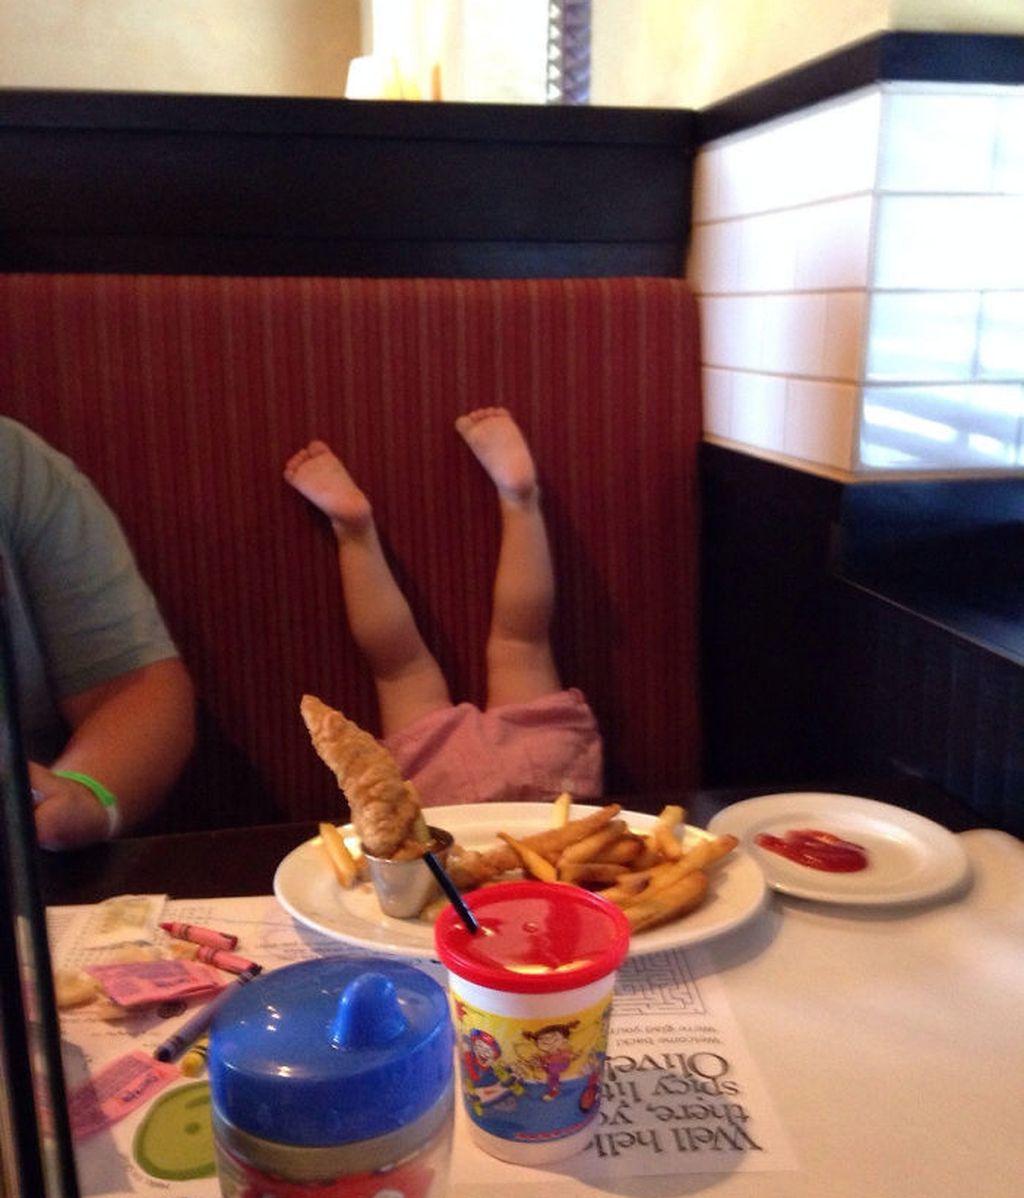 Esta niña no se sentó adecuadamente durante la comida